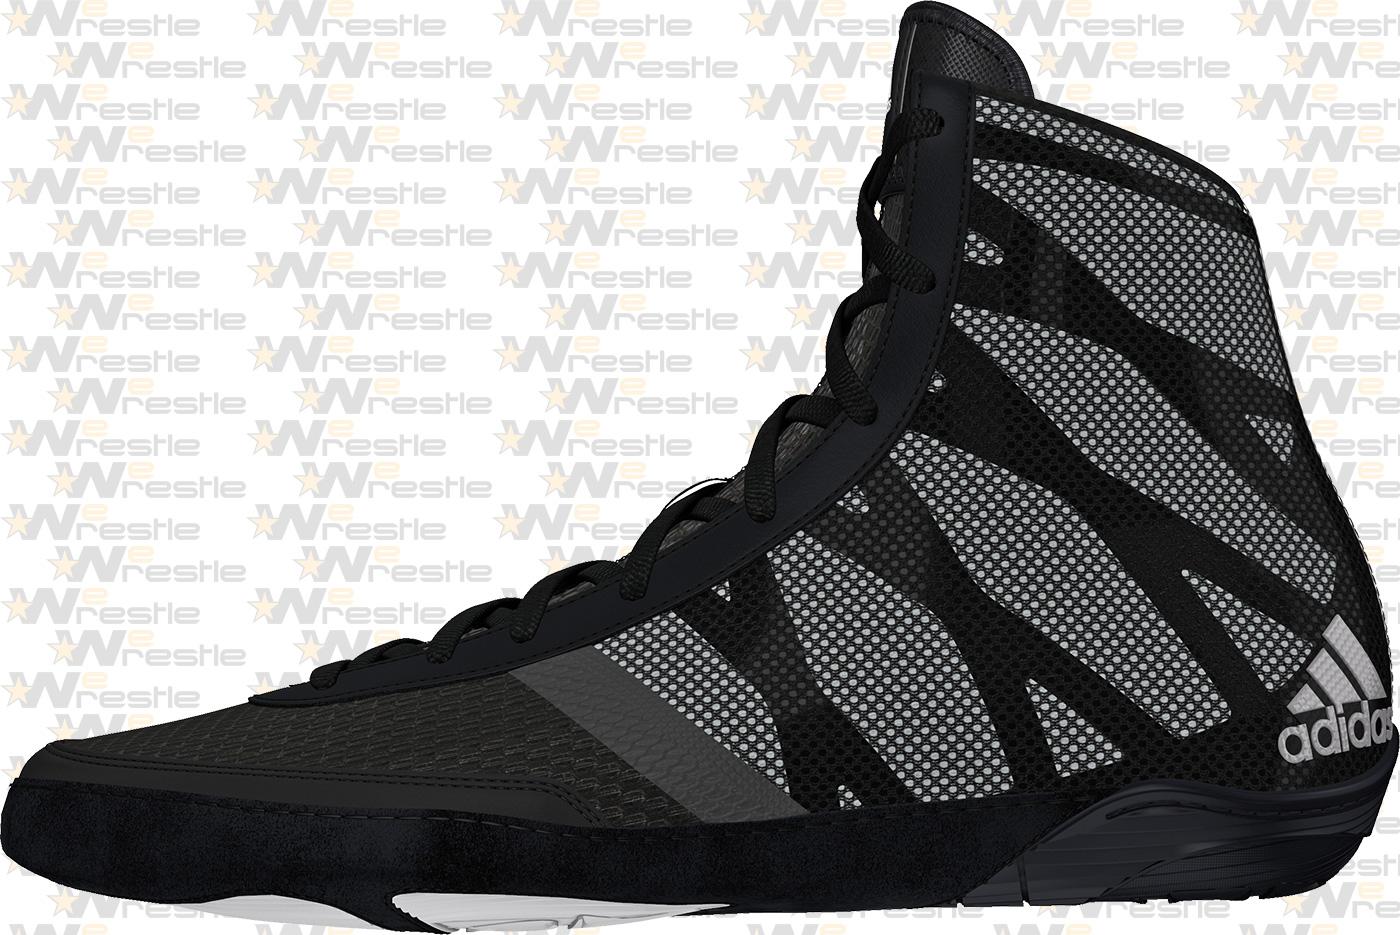 adidas Pretereo III Wrestling Shoes